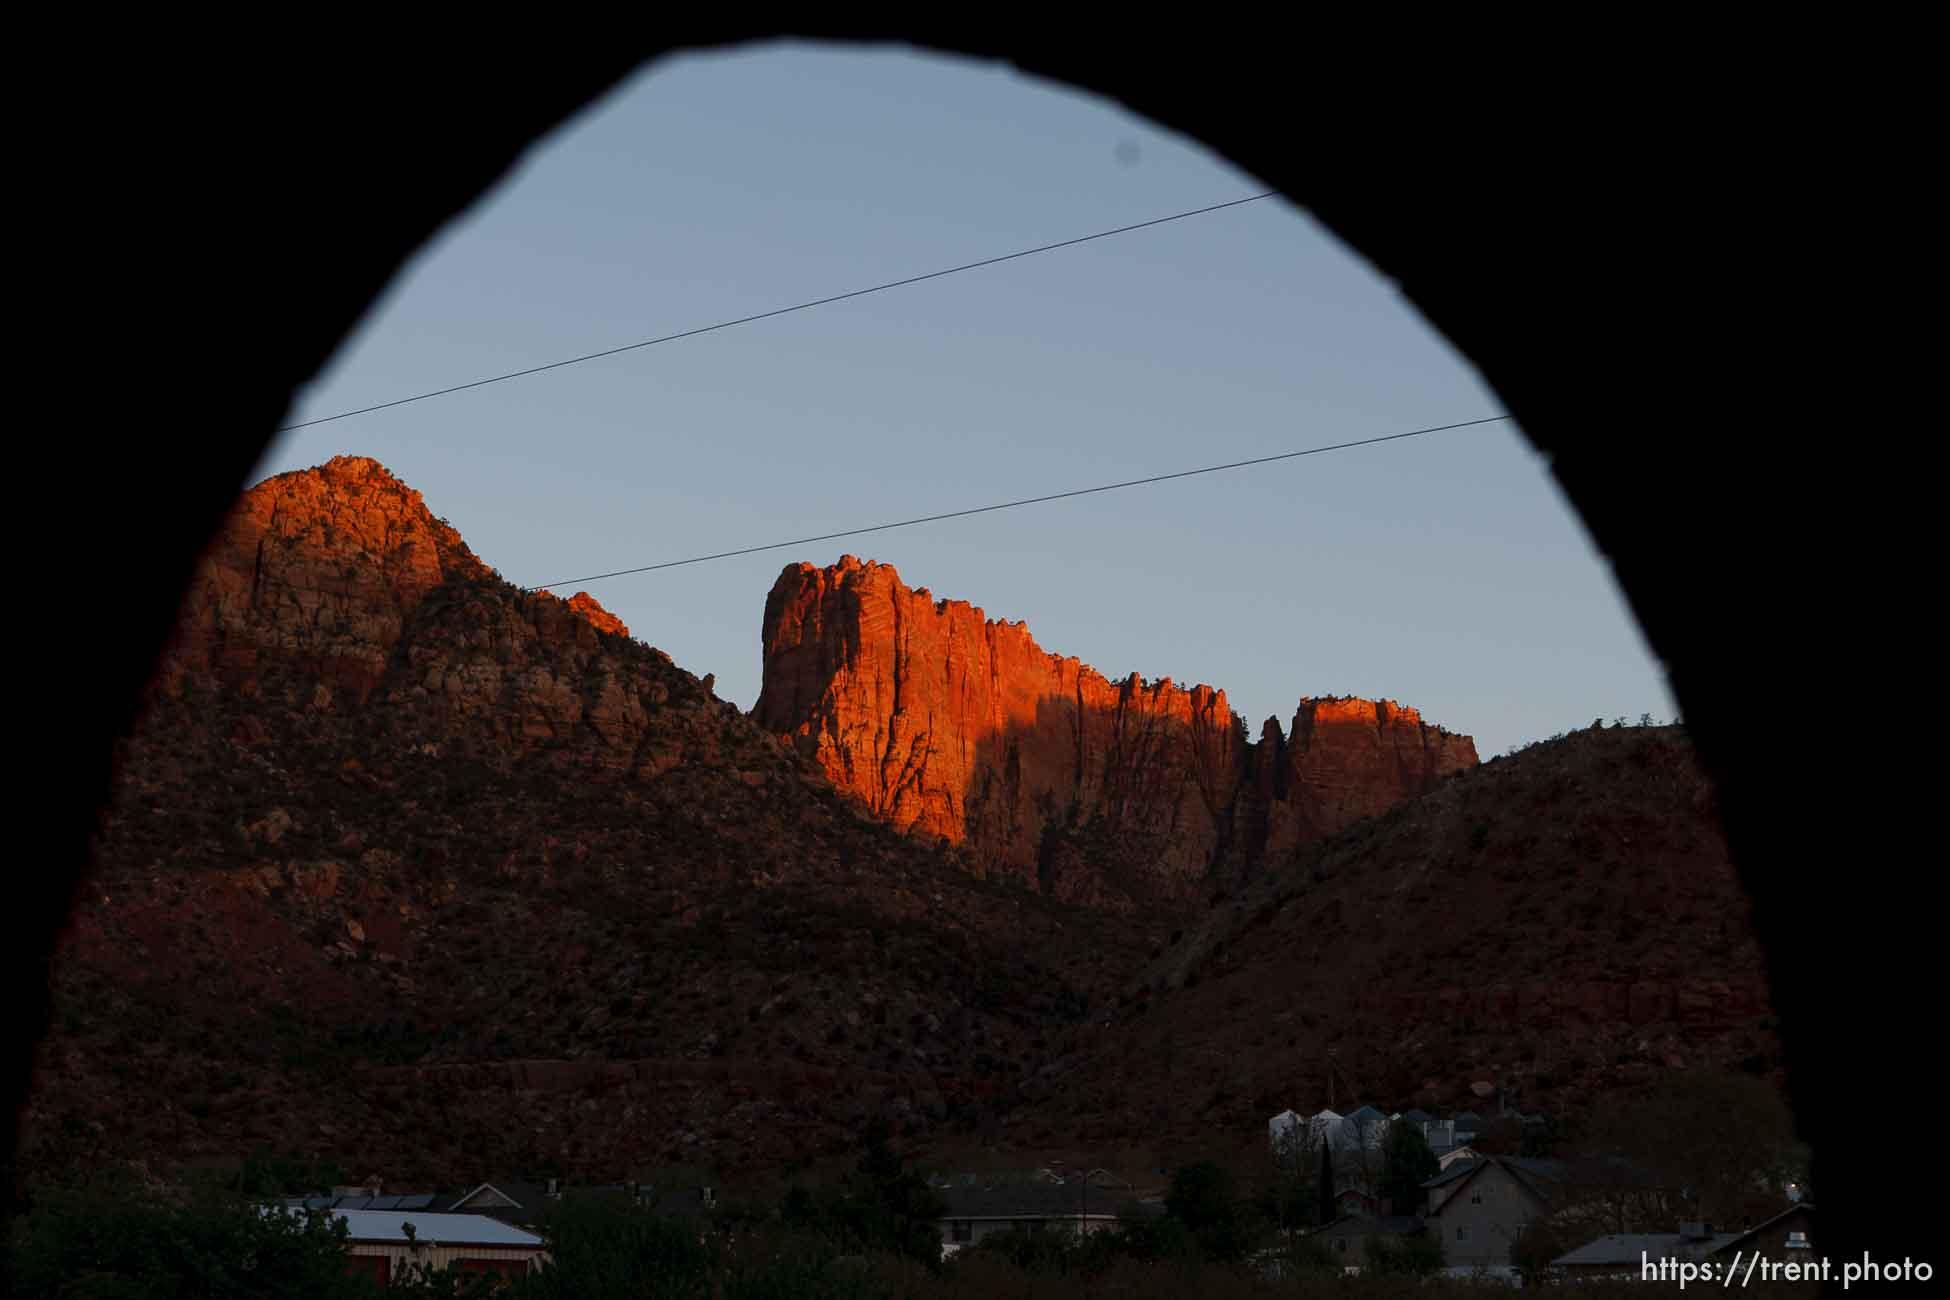 sunrise on el capitan, vermillion cliffs